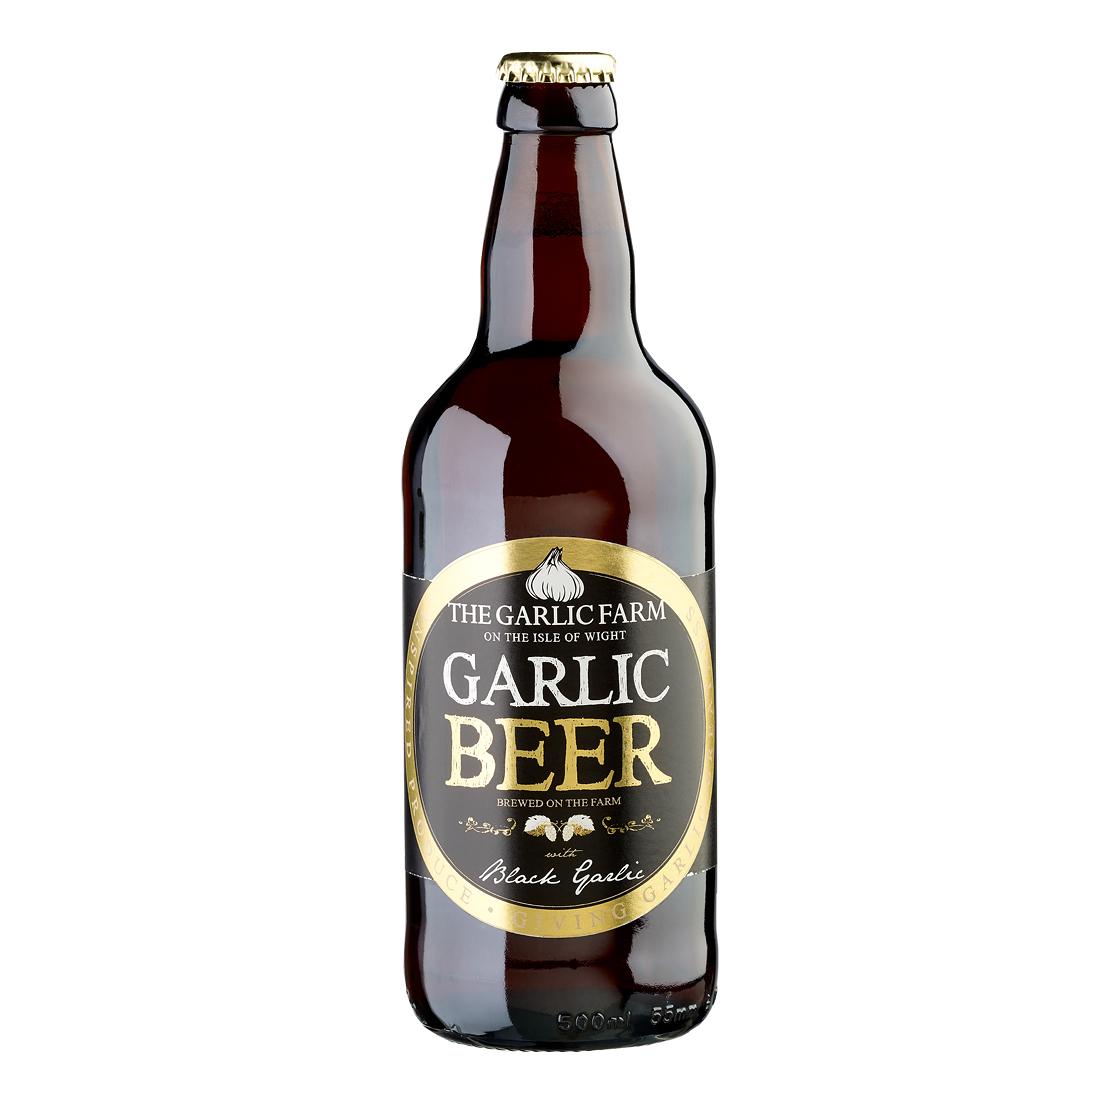 black garlic beer products the garlic farm for all things garlic